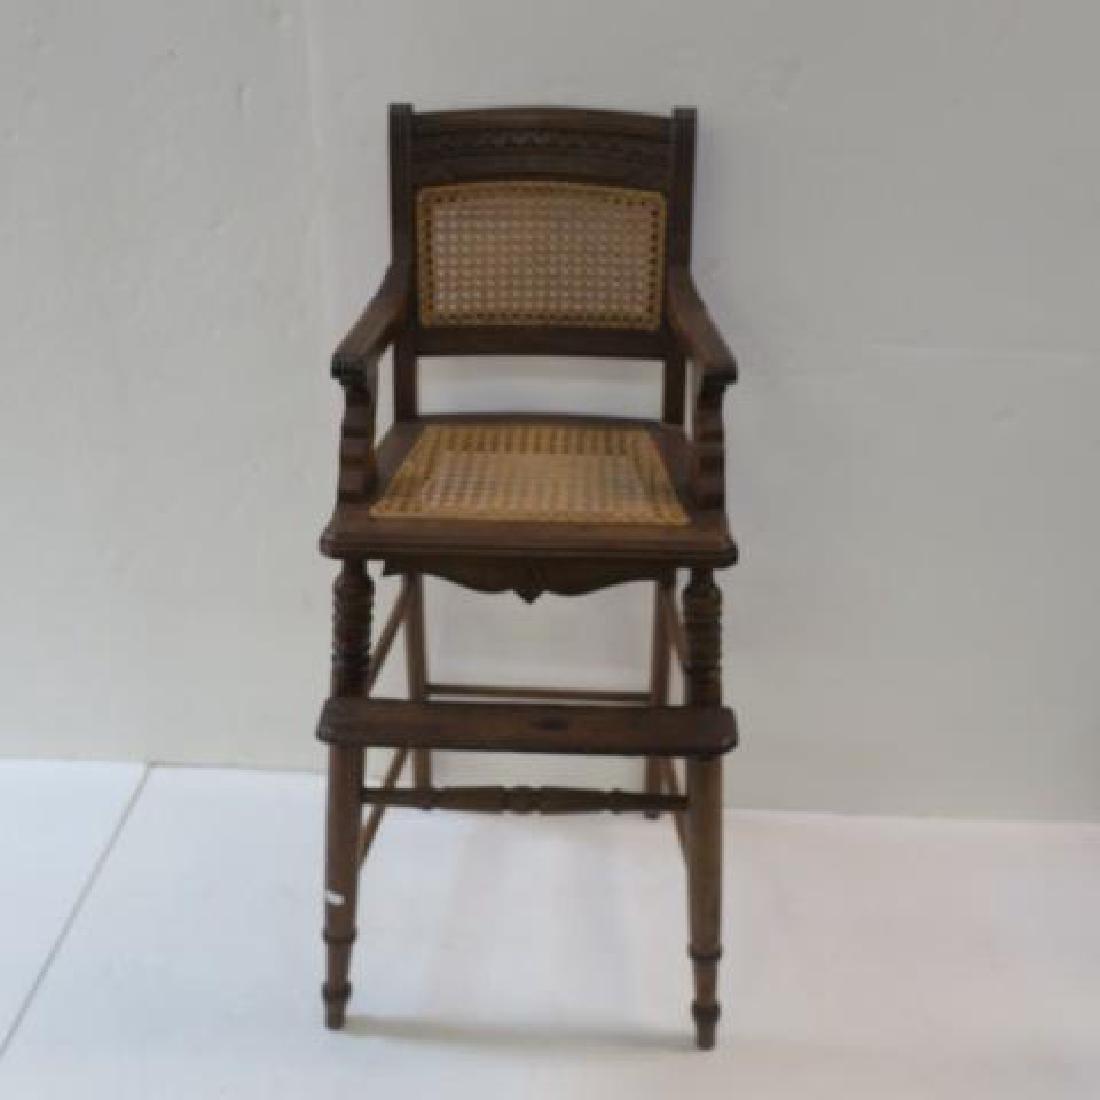 Vintage Eastlake Walnut Childs High Chair: